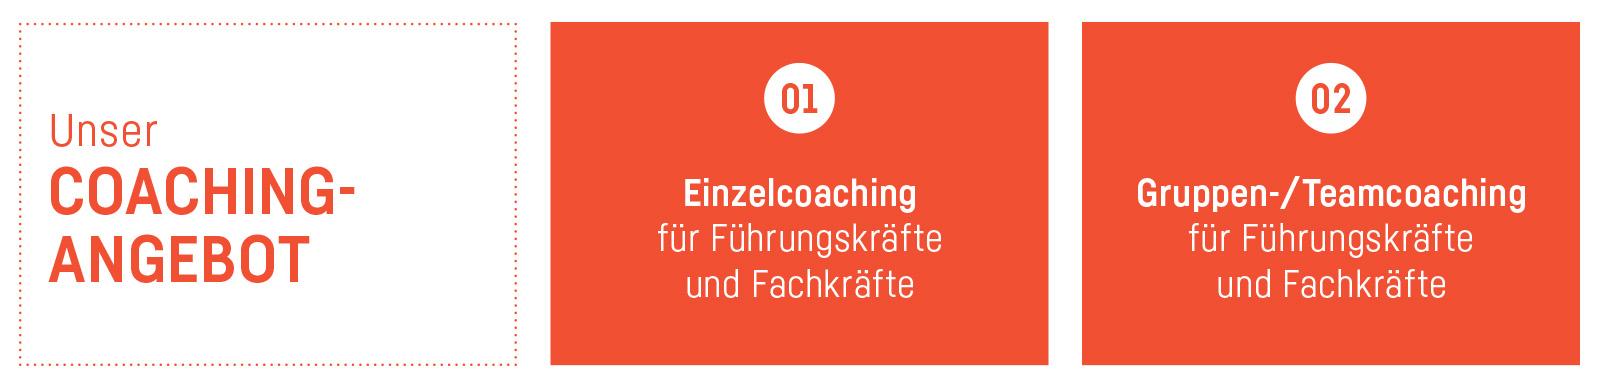 Coachingangebot gfa | public